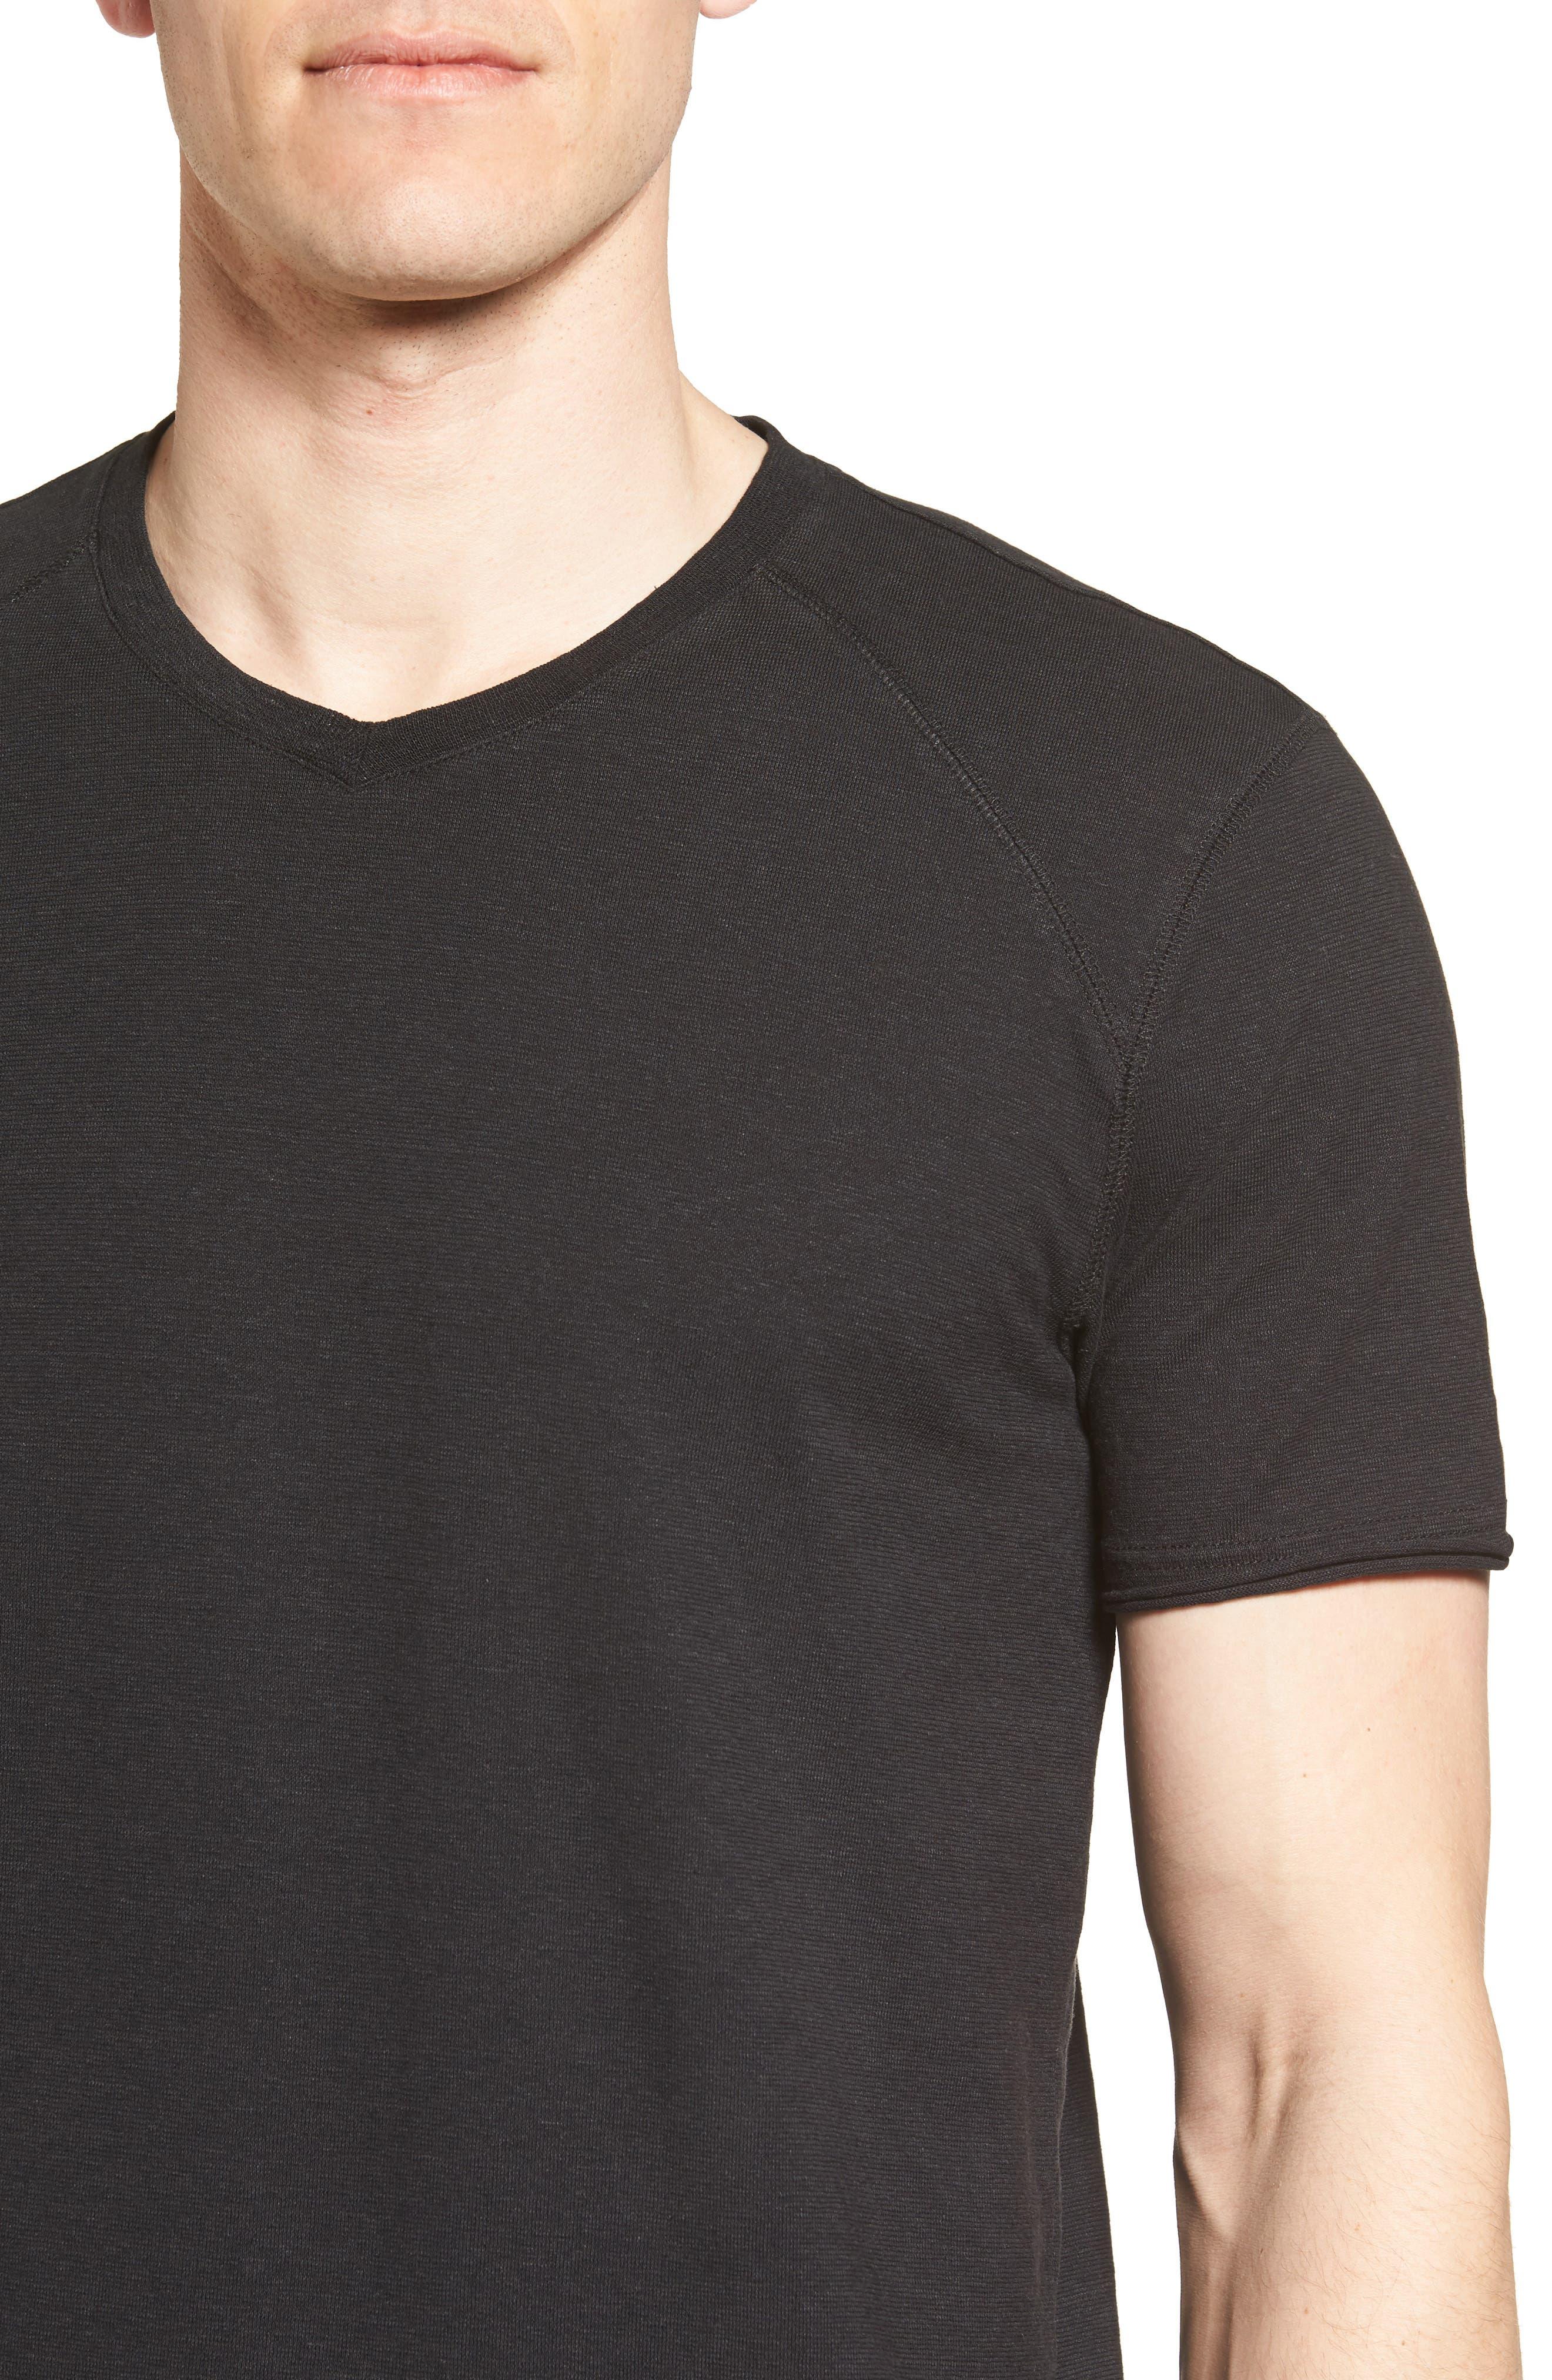 Camura T-Shirt,                             Alternate thumbnail 4, color,                             002